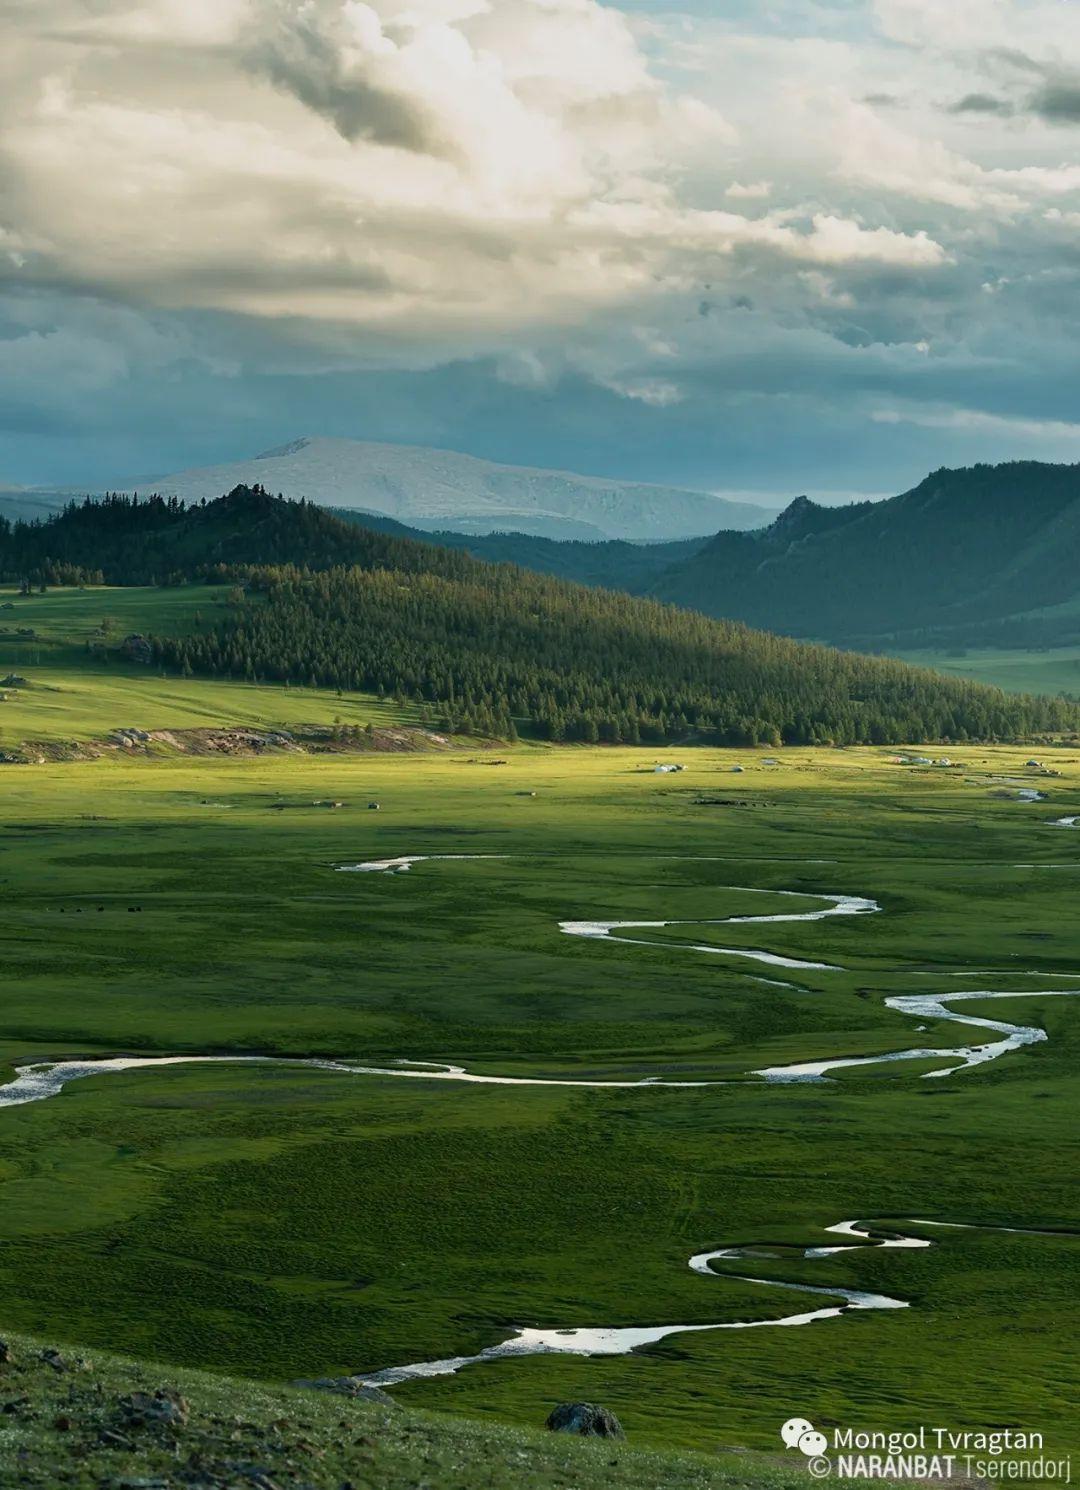 ᠮᠣᠩᠭᠤᠯ ᠰᠡᠭᠦᠳᠡᠷ- ᠴ᠂ ᠨᠠᠷᠠᠨᠪᠠᠲᠤ 第20张 ᠮᠣᠩᠭᠤᠯ ᠰᠡᠭᠦᠳᠡᠷ- ᠴ᠂ ᠨᠠᠷᠠᠨᠪᠠᠲᠤ 蒙古文化